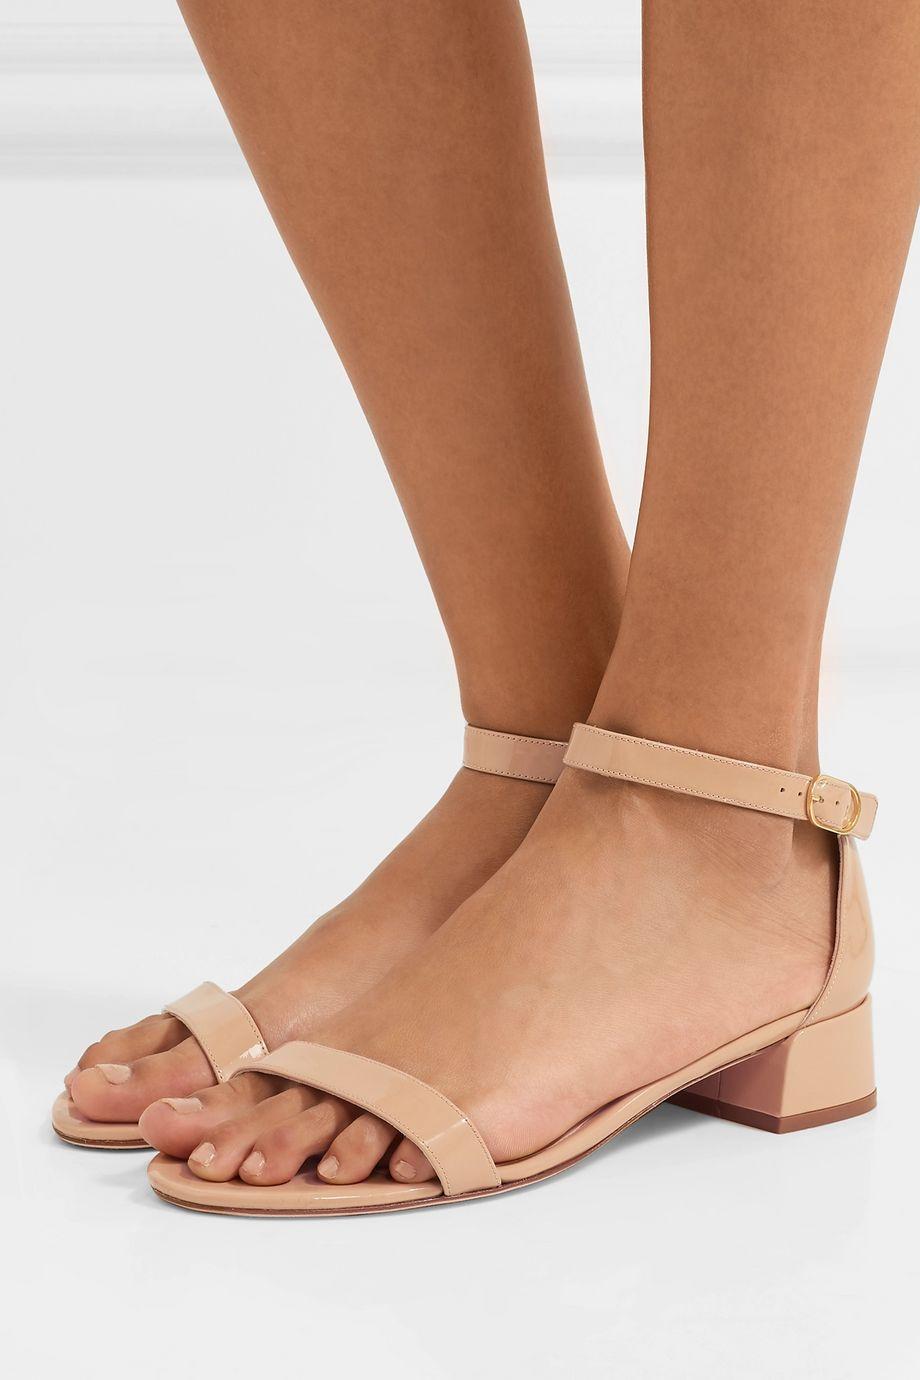 Stuart Weitzman NudistJune patent-leather sandals